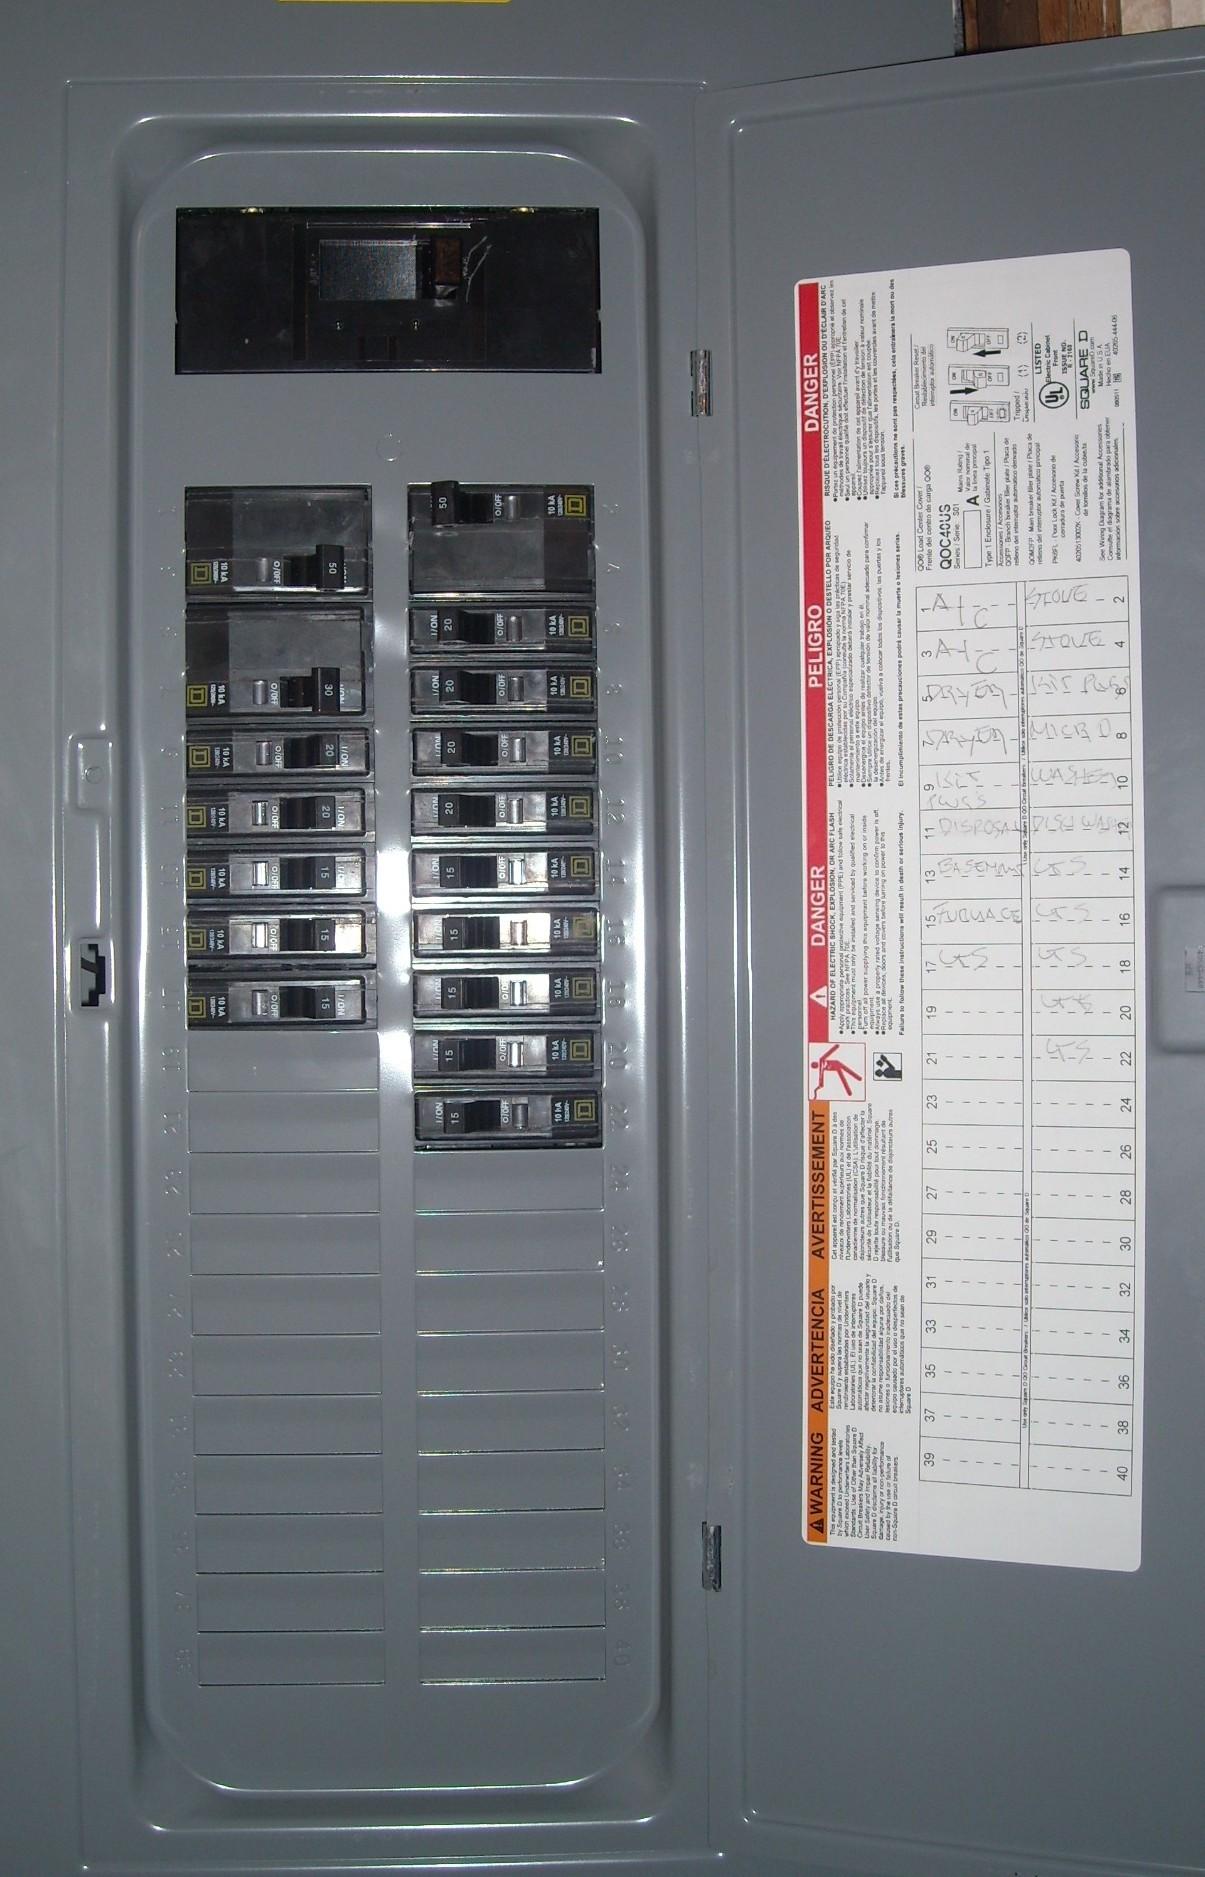 Home Fuse Box Heater Wiring Diagram Data Main Breaker Hot Water Audio